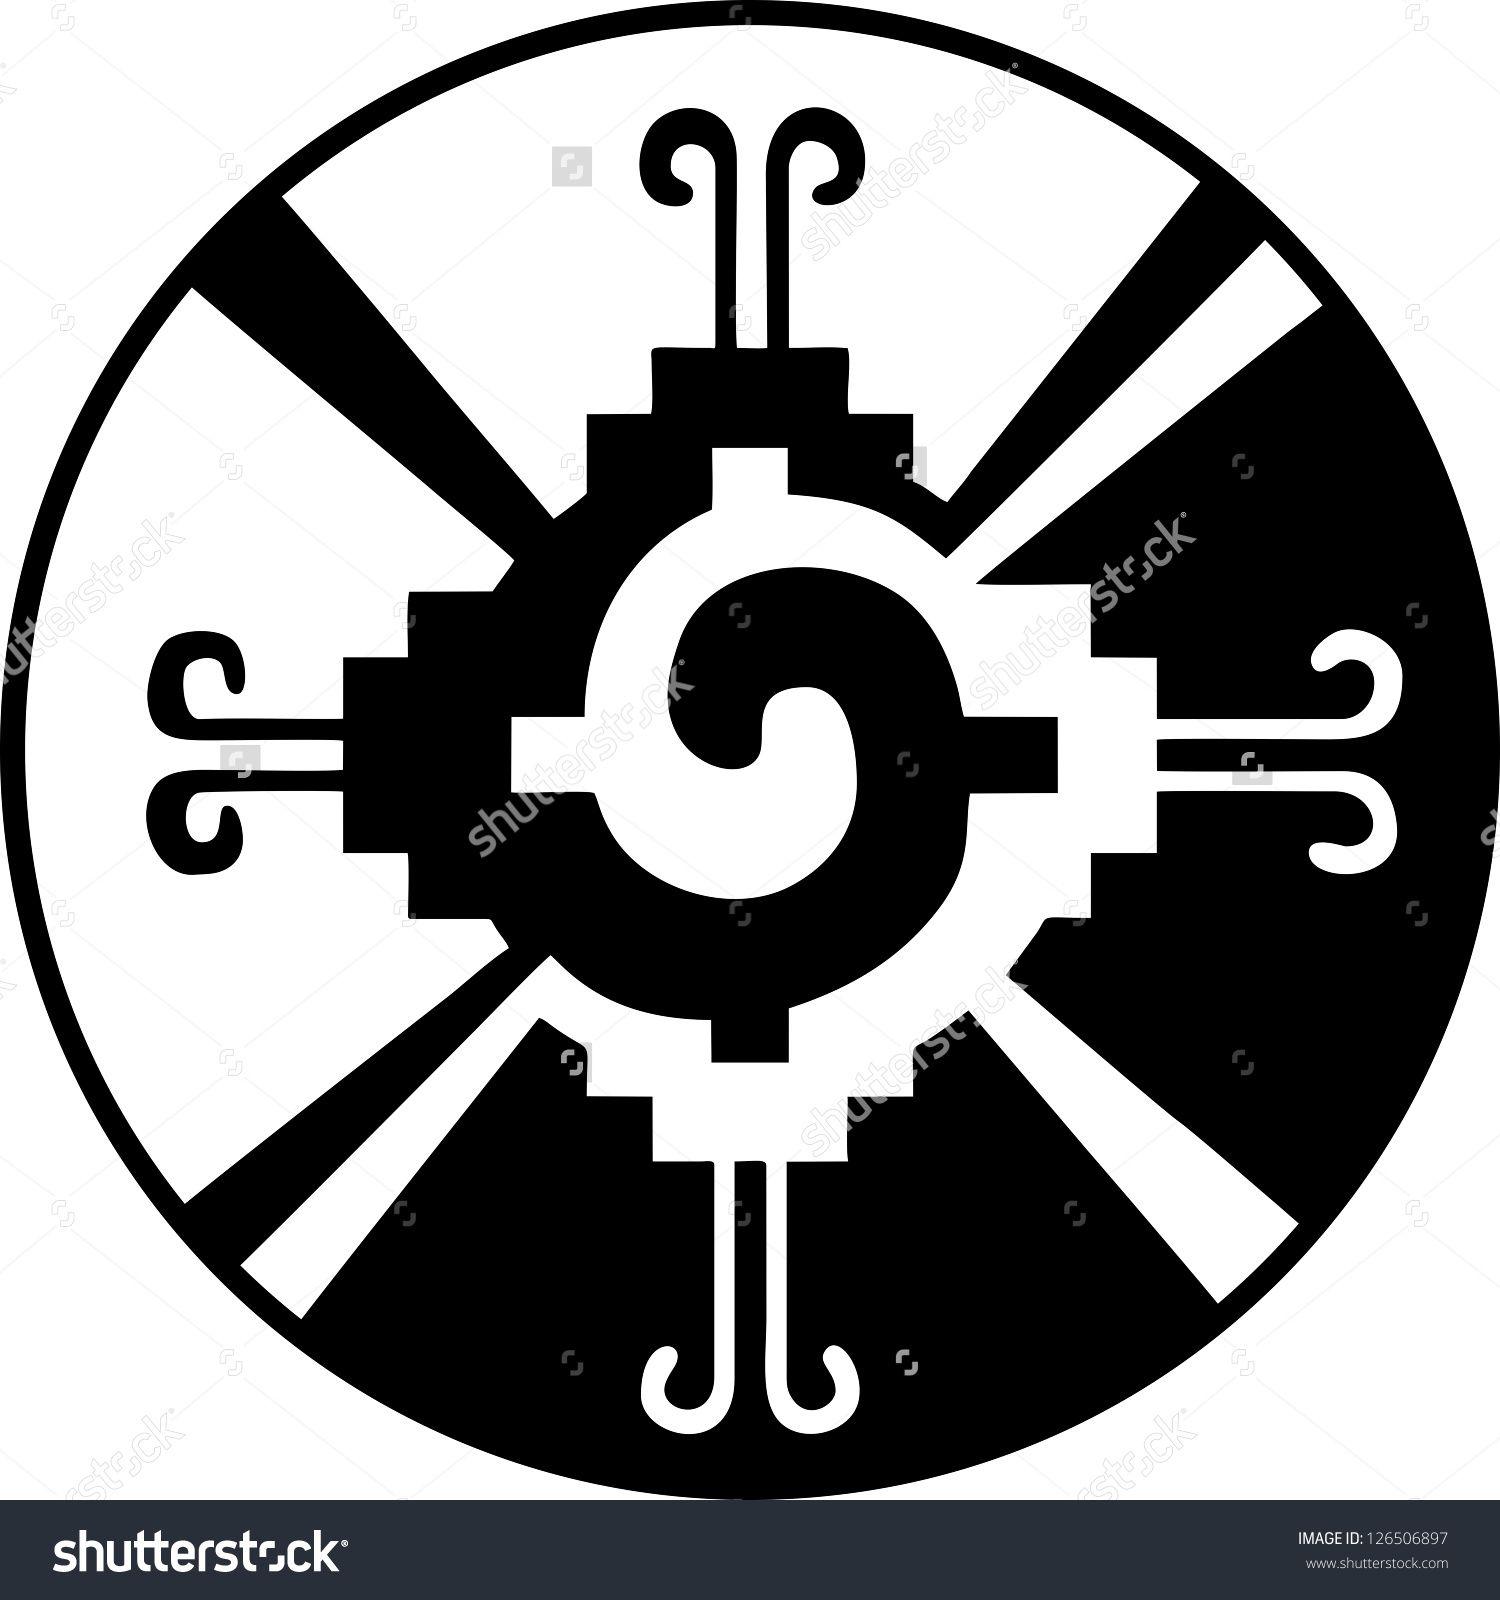 Hunab Ku -Heart of the Galaxy - Mayan symbol for God ...